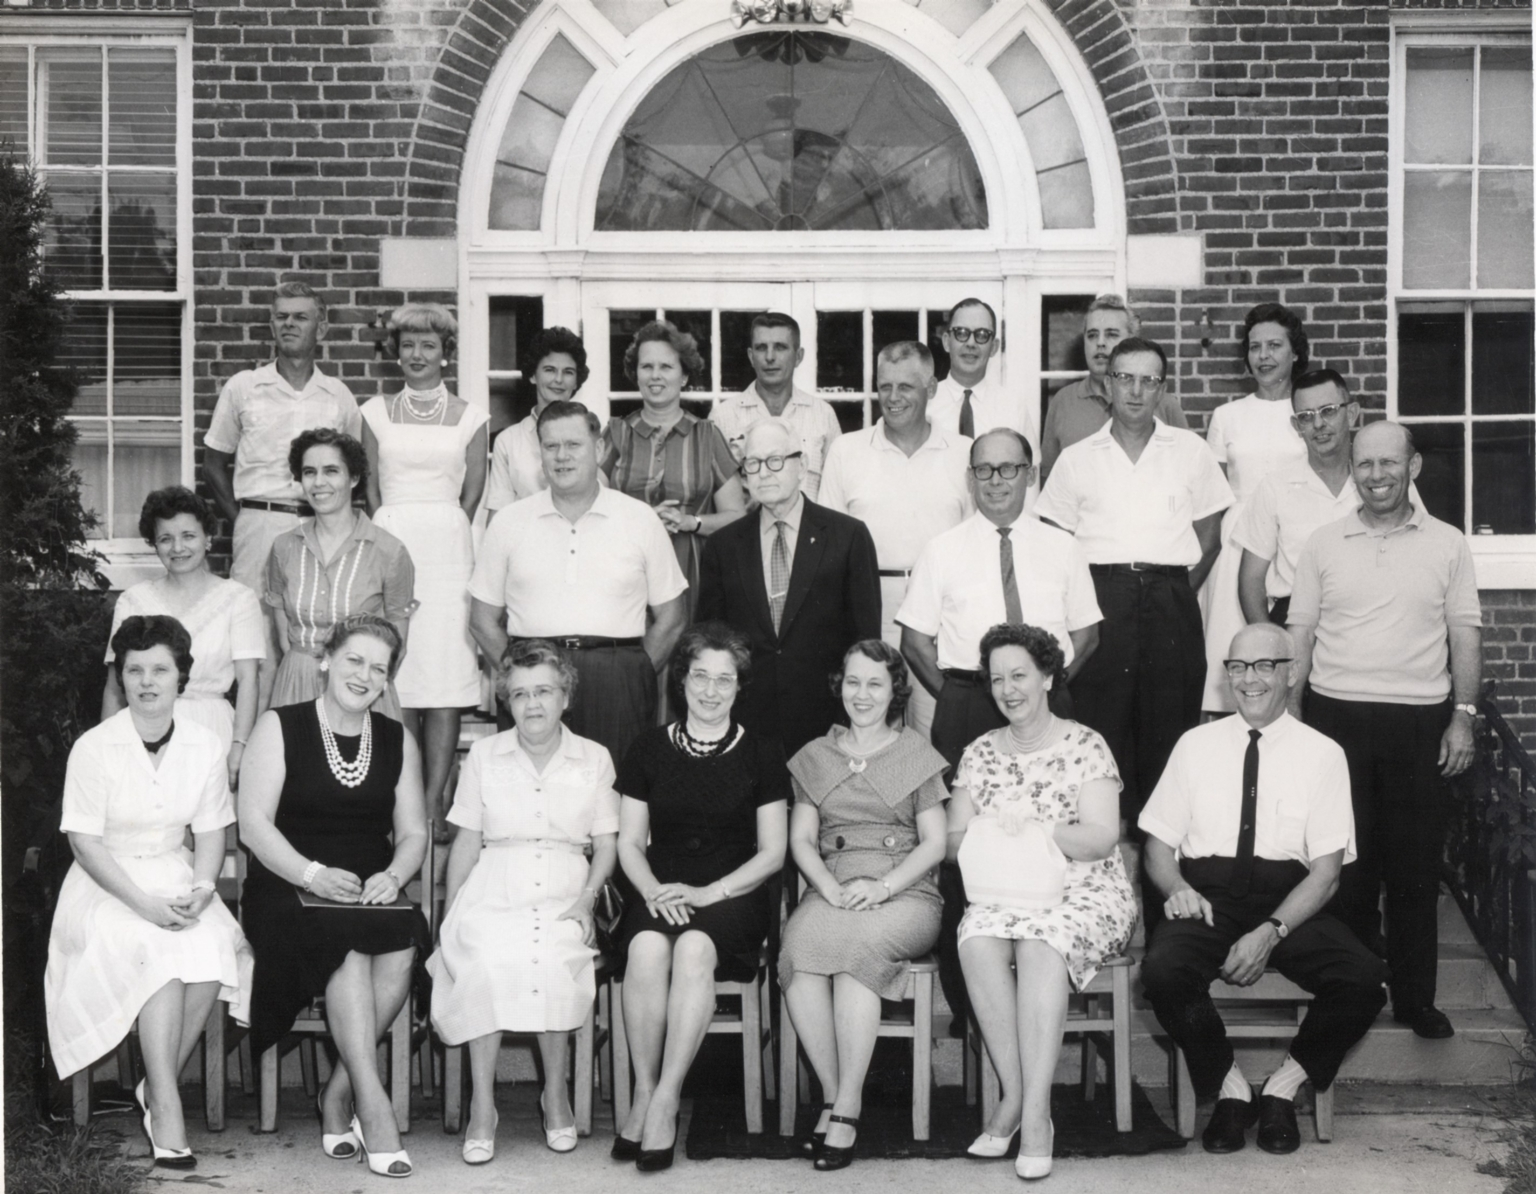 Newspaper article on reunion of Lone Oak High School class of 1937